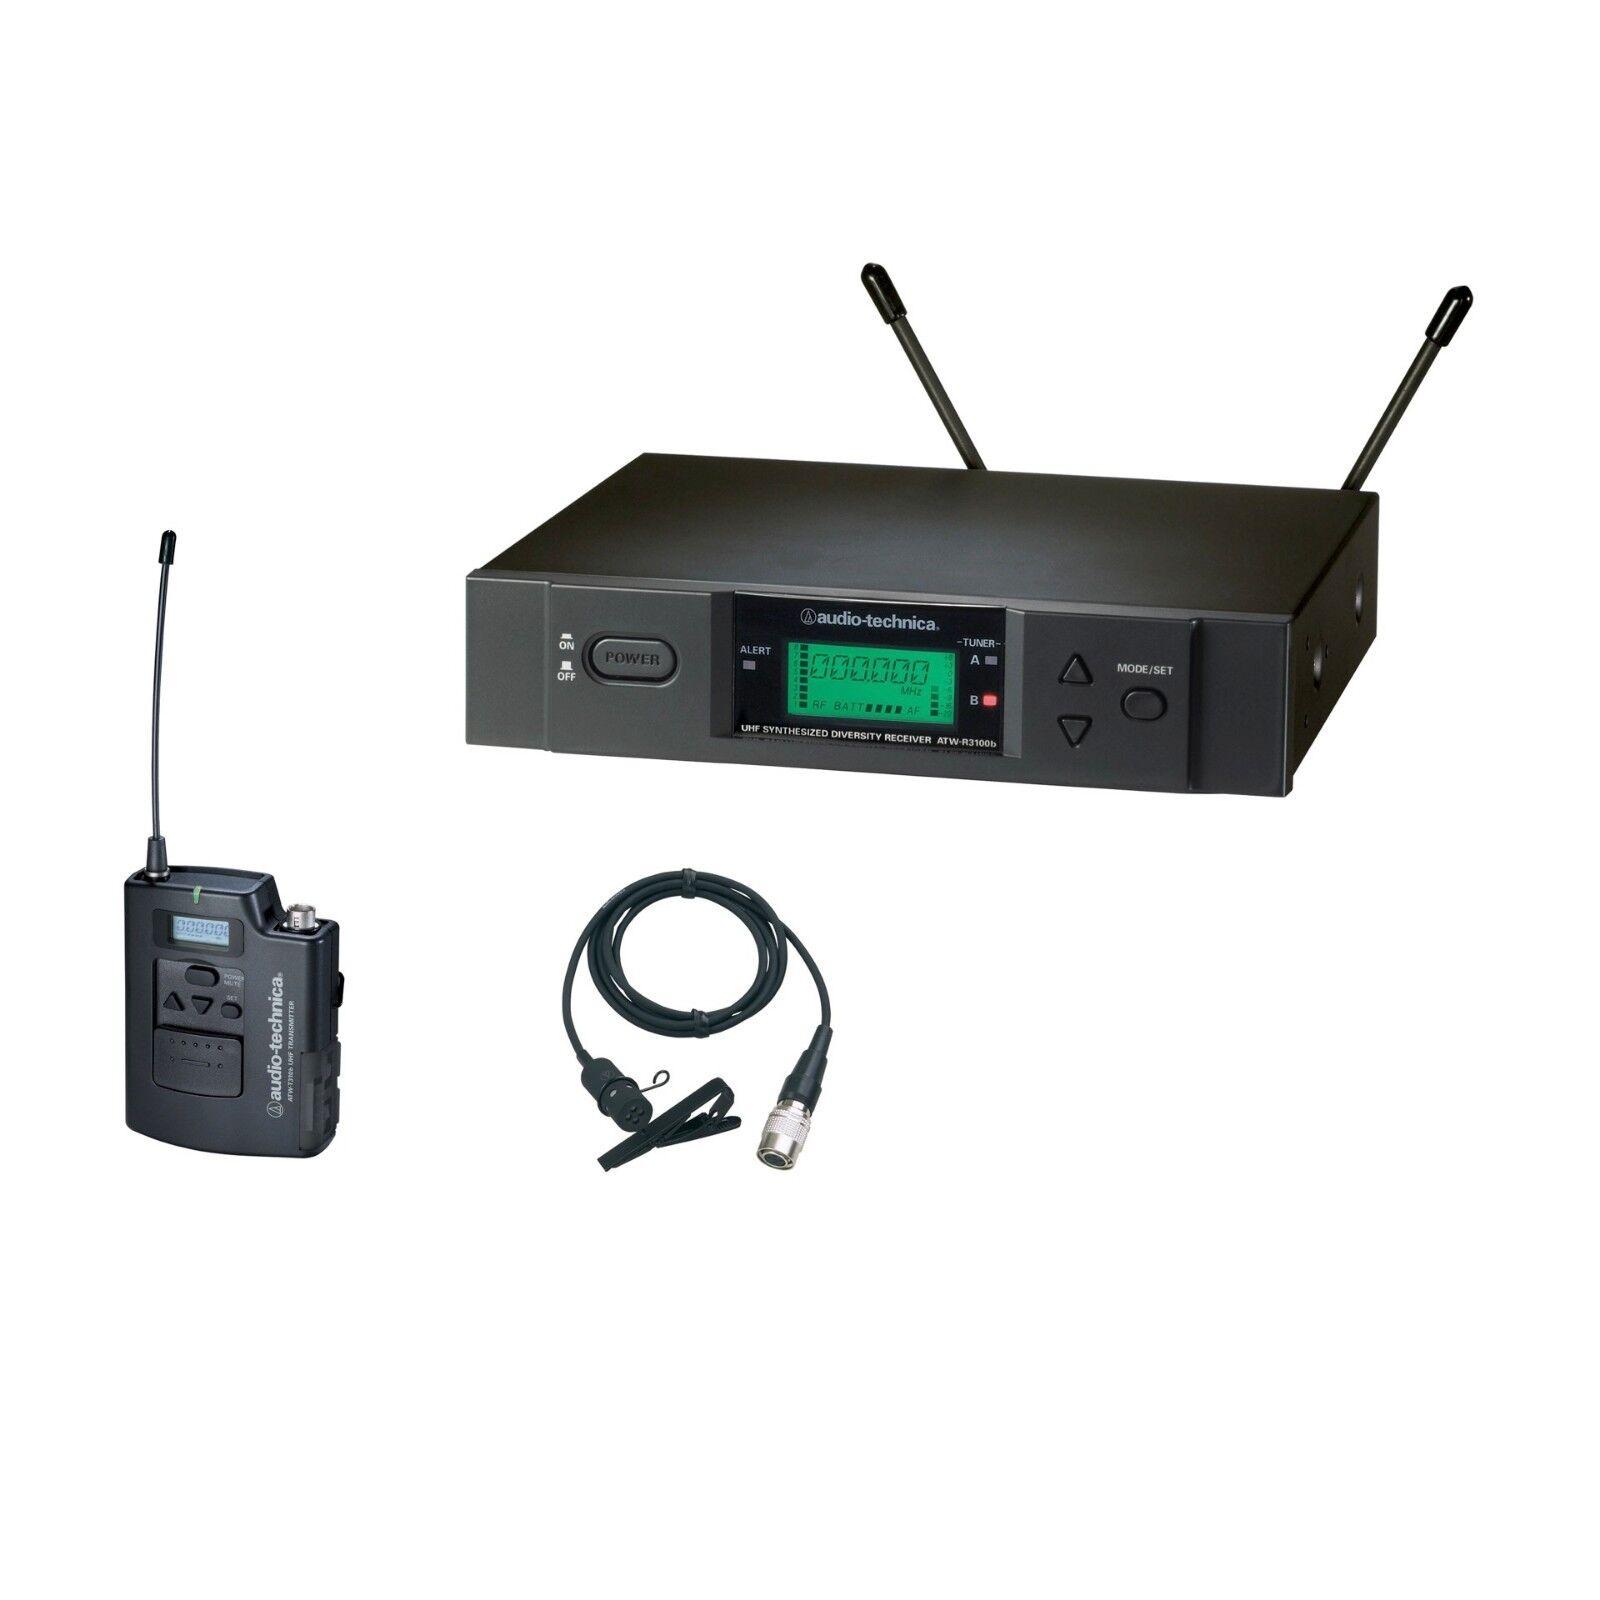 Audio-Technica ATW-3131b 3000 Series Wireless Lavalier System